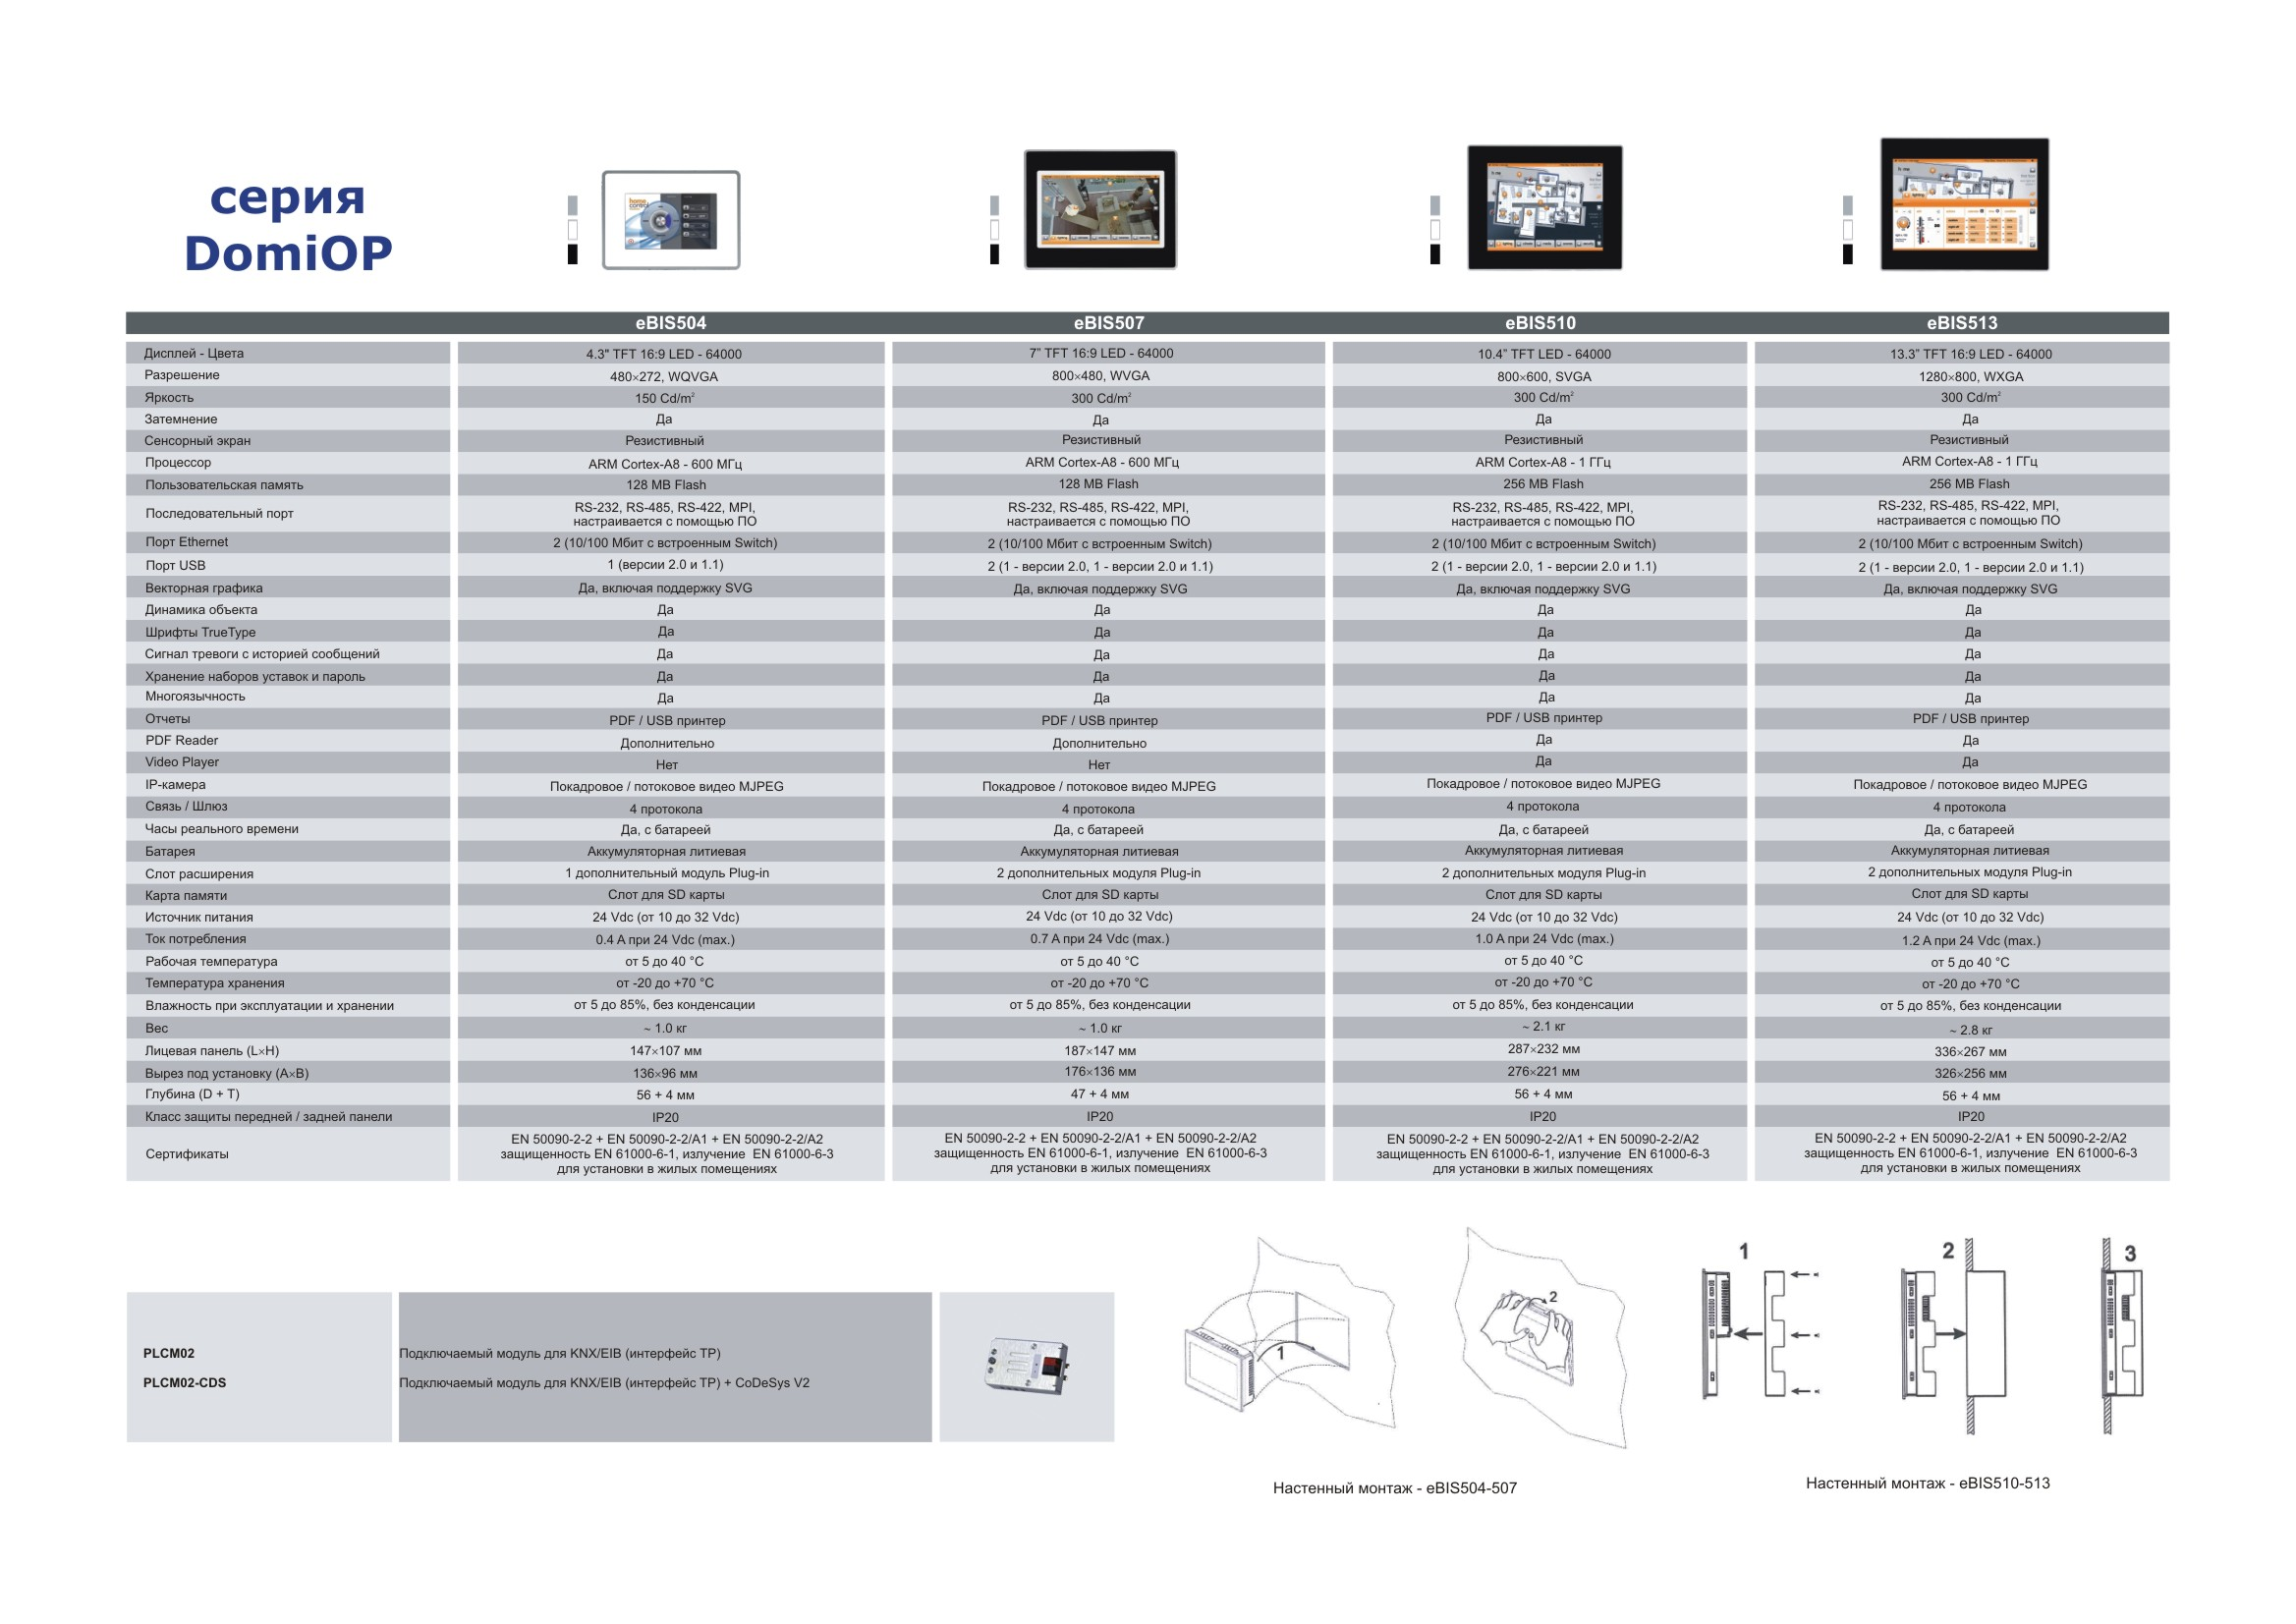 Технические характеристики панелей DomiOP